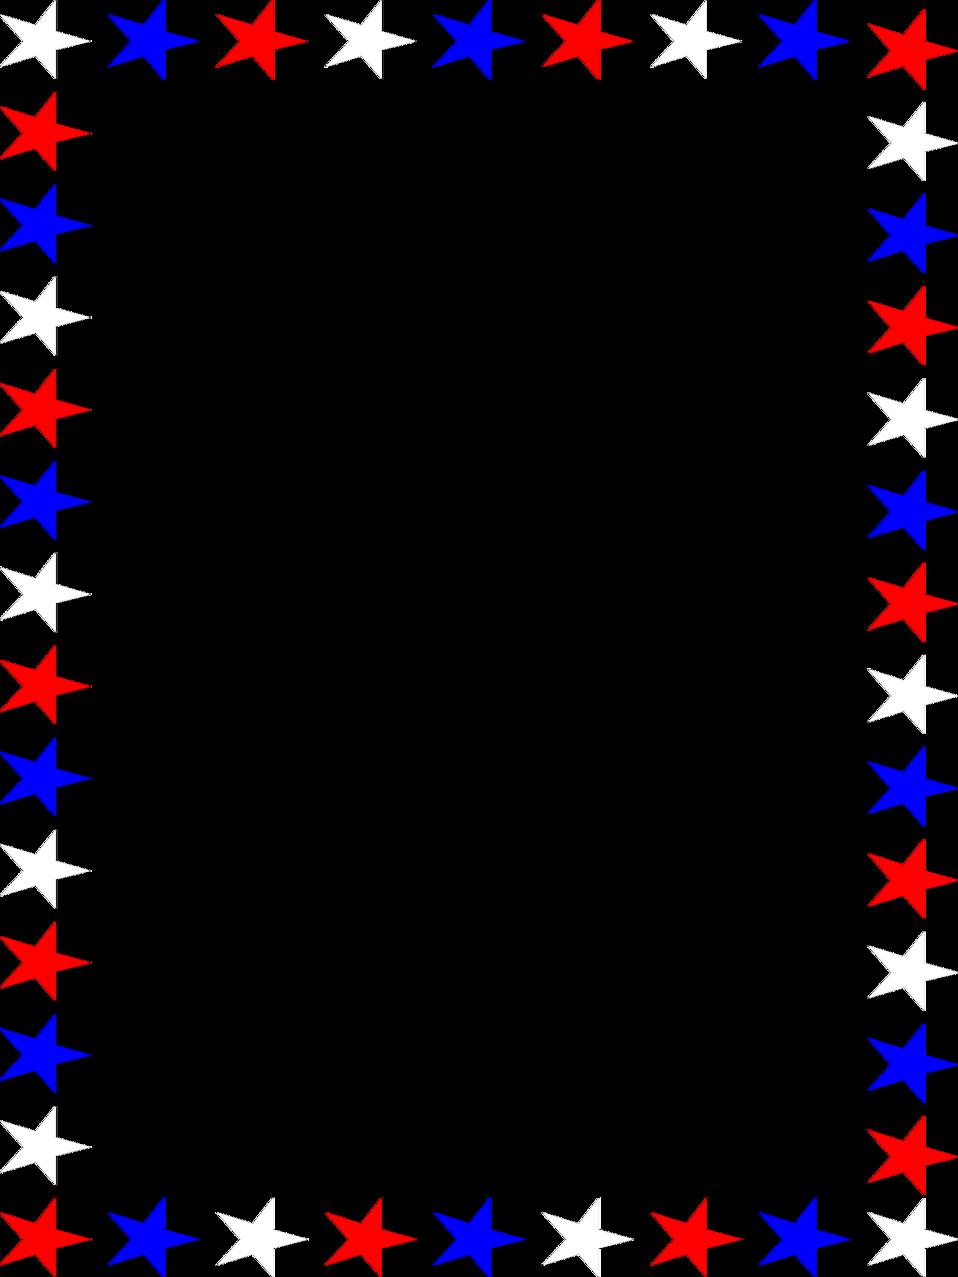 958x1277 Free Stars Clipart Border Image